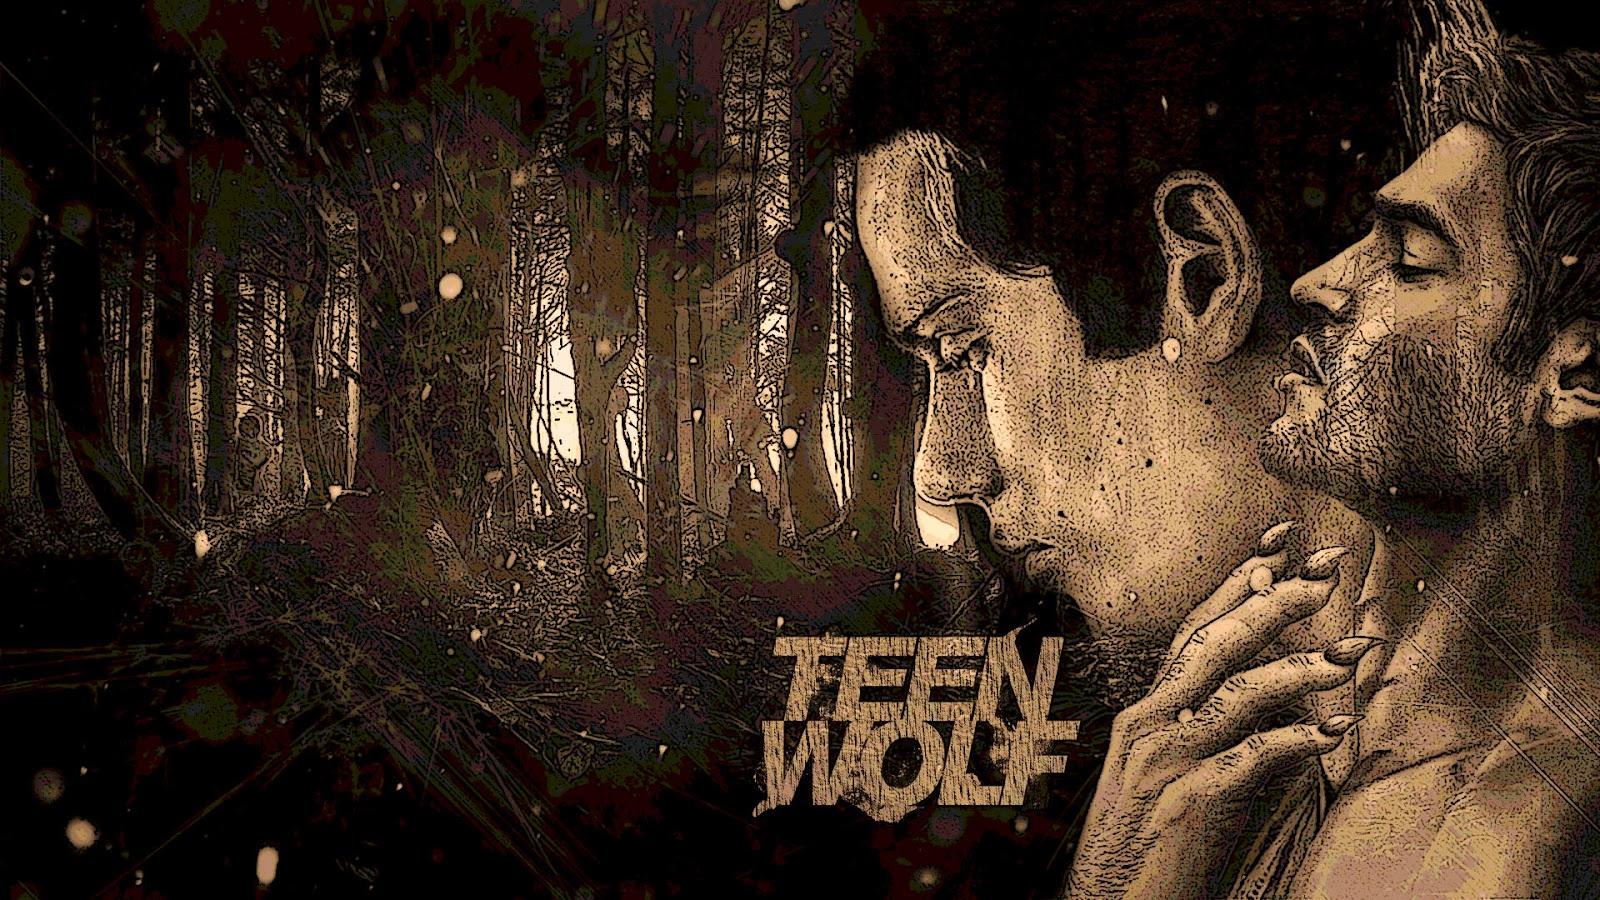 Teen Wolf Sterek's Haunted Forest Wallpaper - Hd Wallpaper Teen Wolf Stiles , HD Wallpaper & Backgrounds